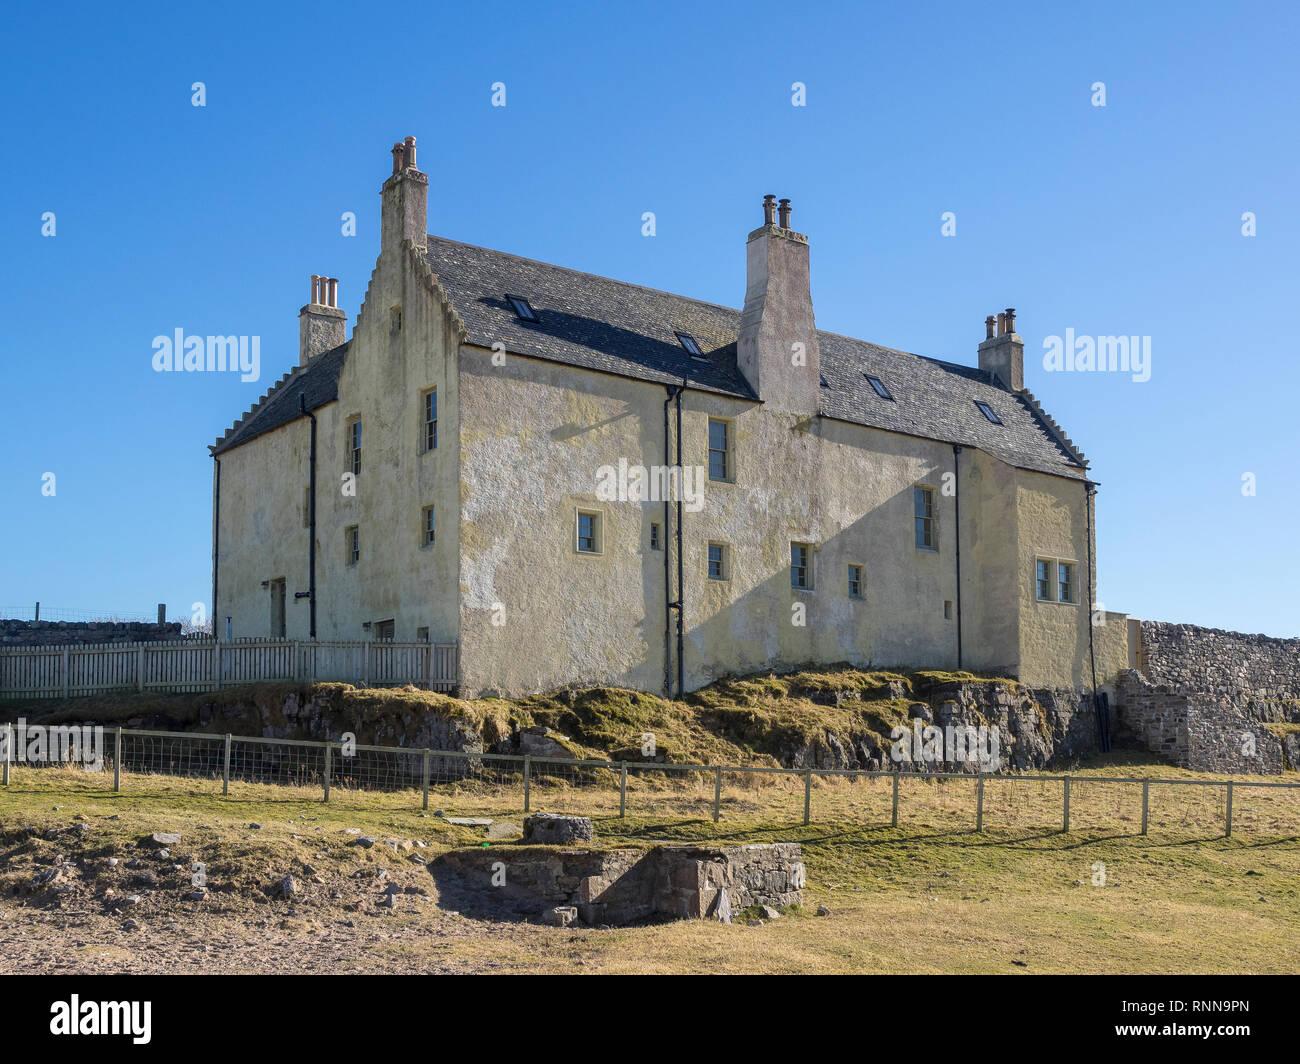 Balnakeil House, Balnakeil Bay near Durness, Sutherland, Scotland - Stock Image